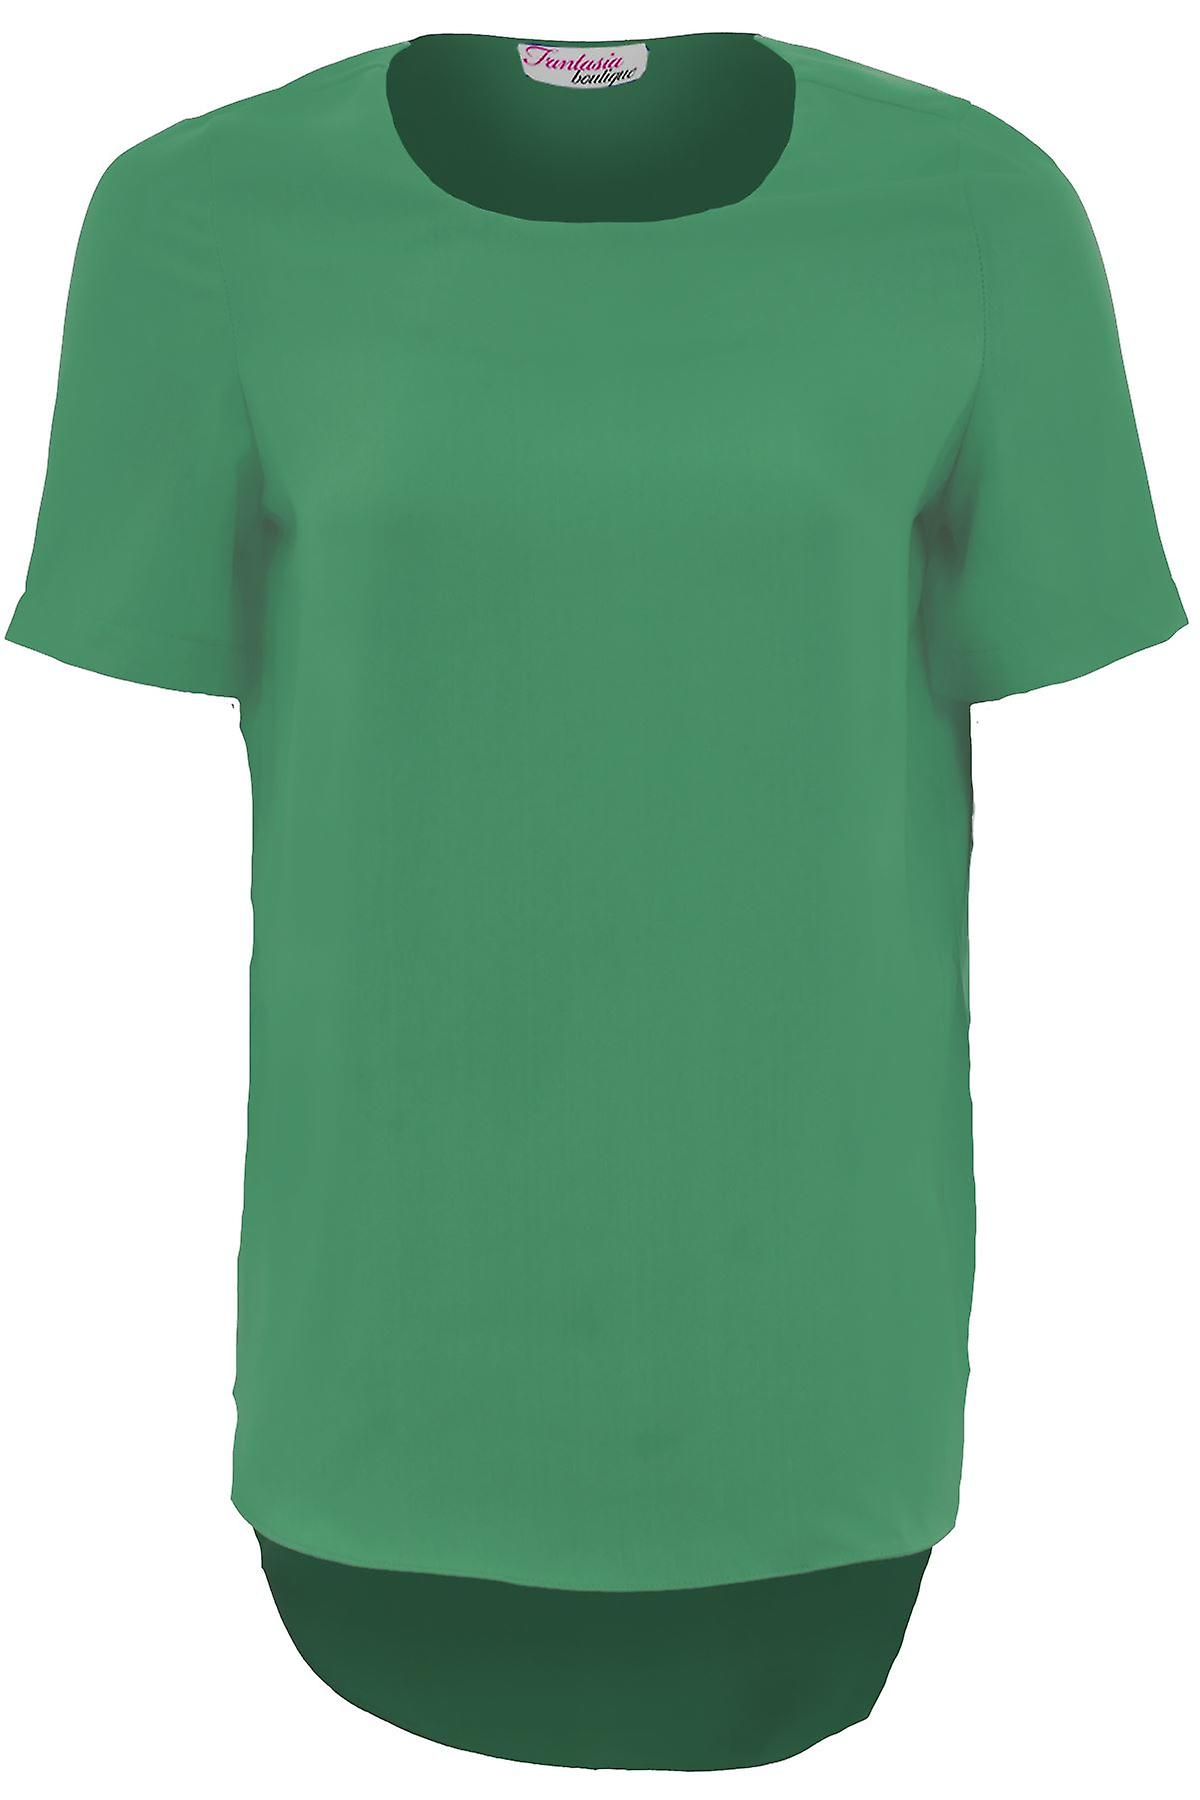 Ladies Short Sleeve High Low Plain Women's Oversized Baggy Smart T-Shirt Top